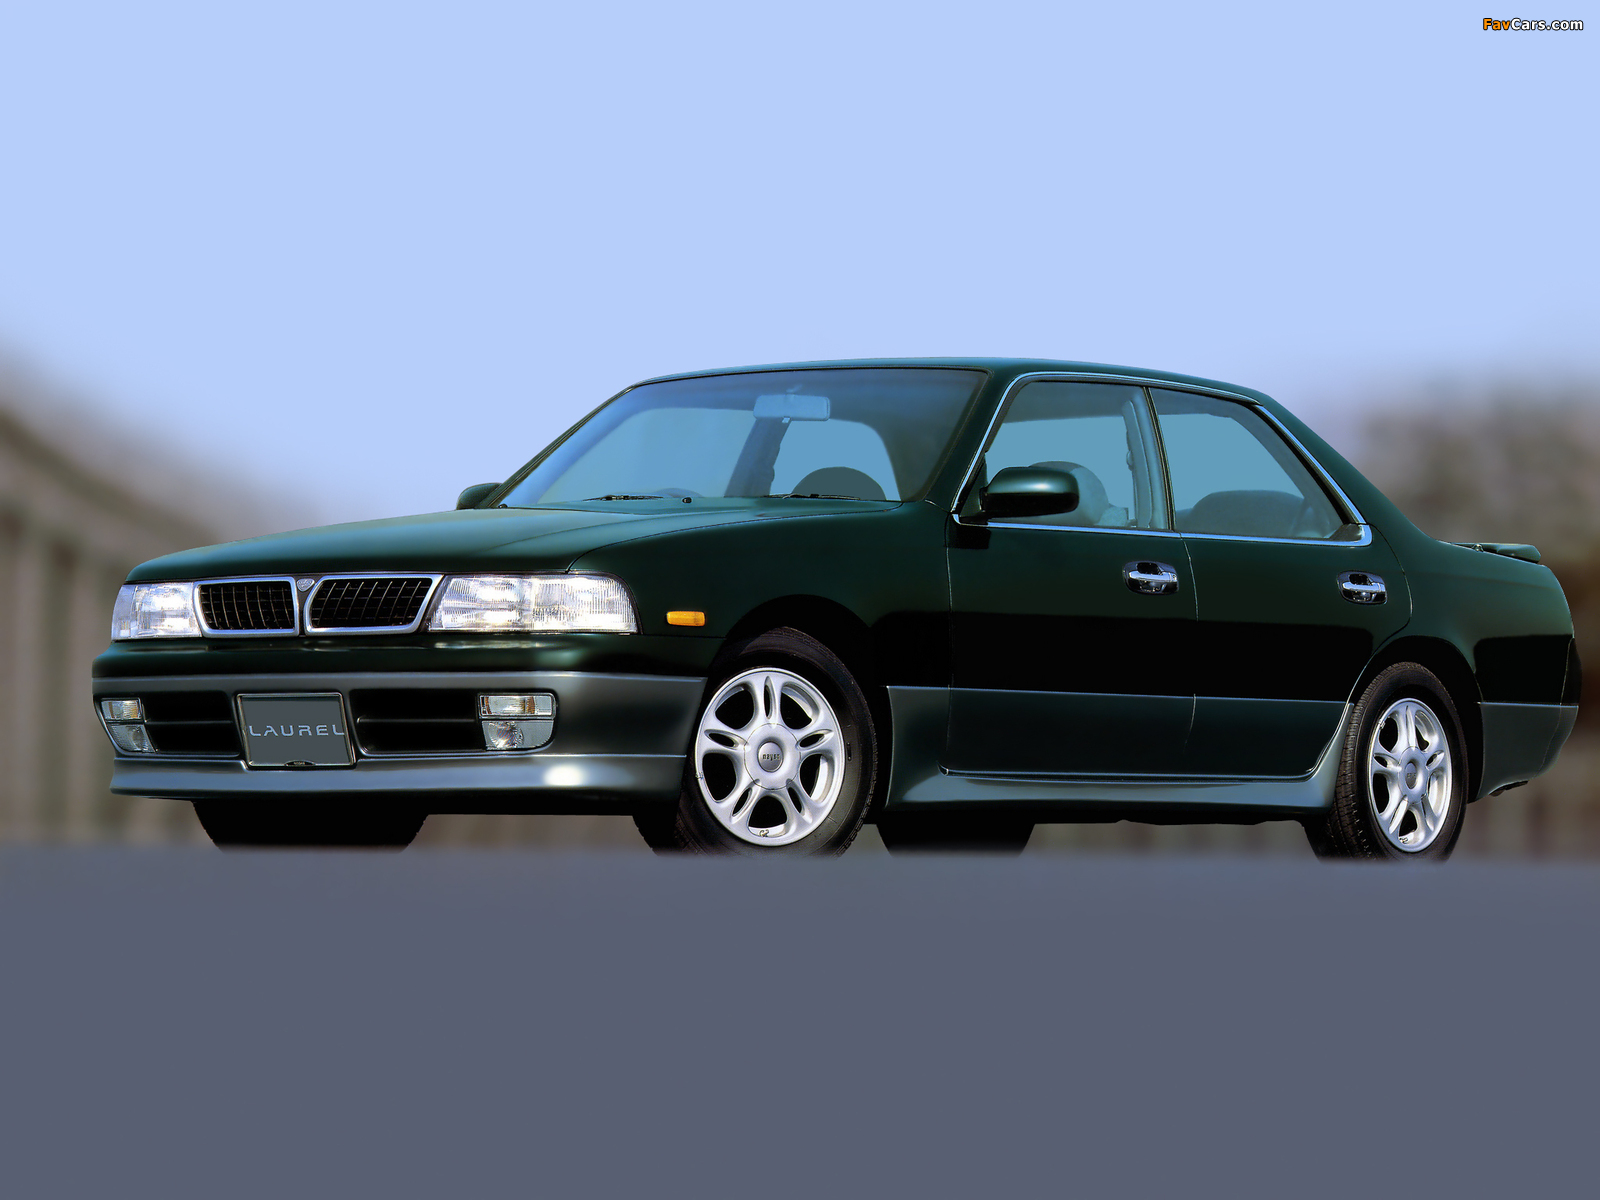 Nissan Laurel Club S (C34) 1993–94 wallpapers (1600 x 1200)